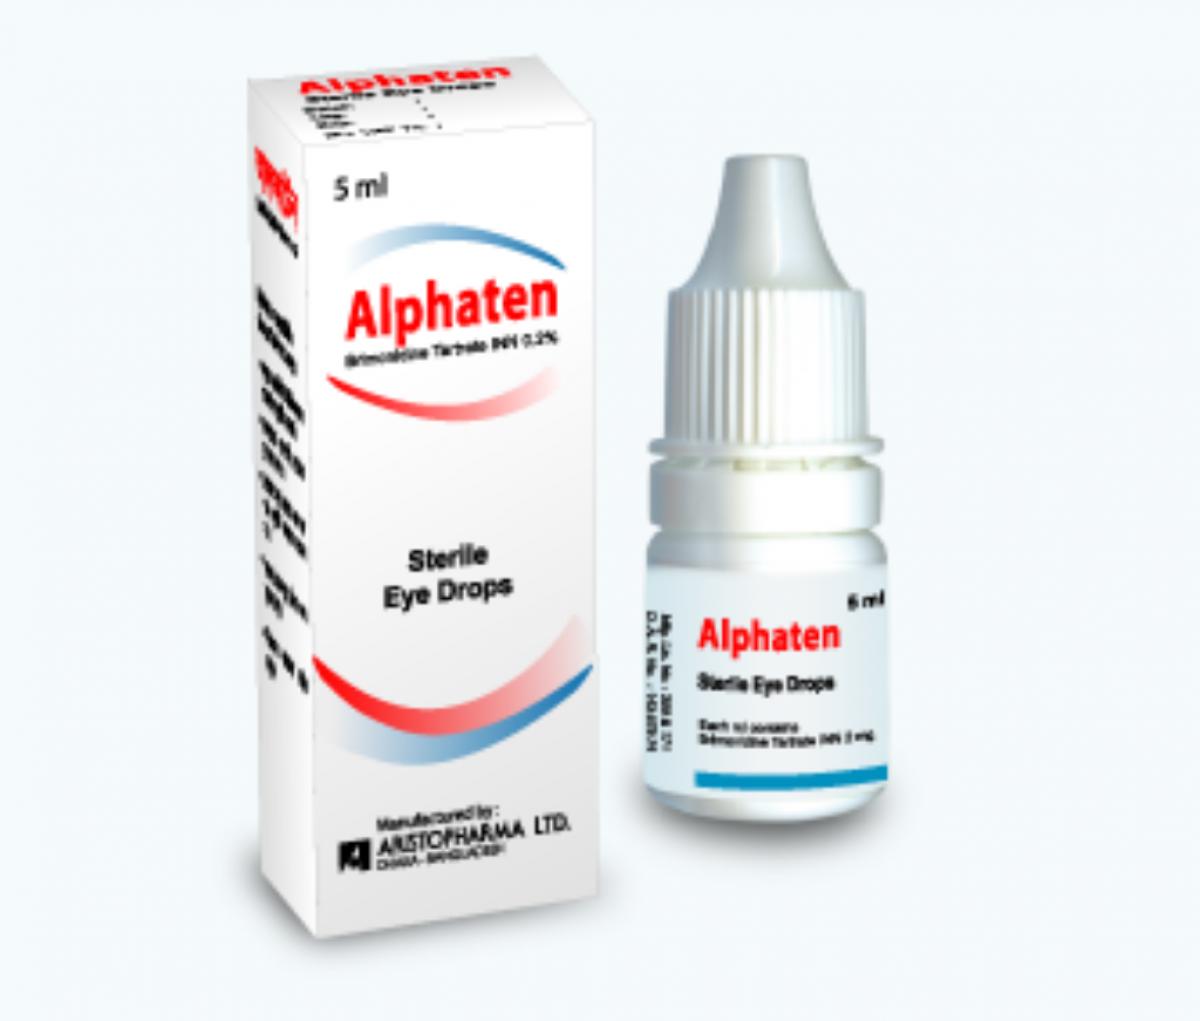 Alphaten 0.2% Eye Drop